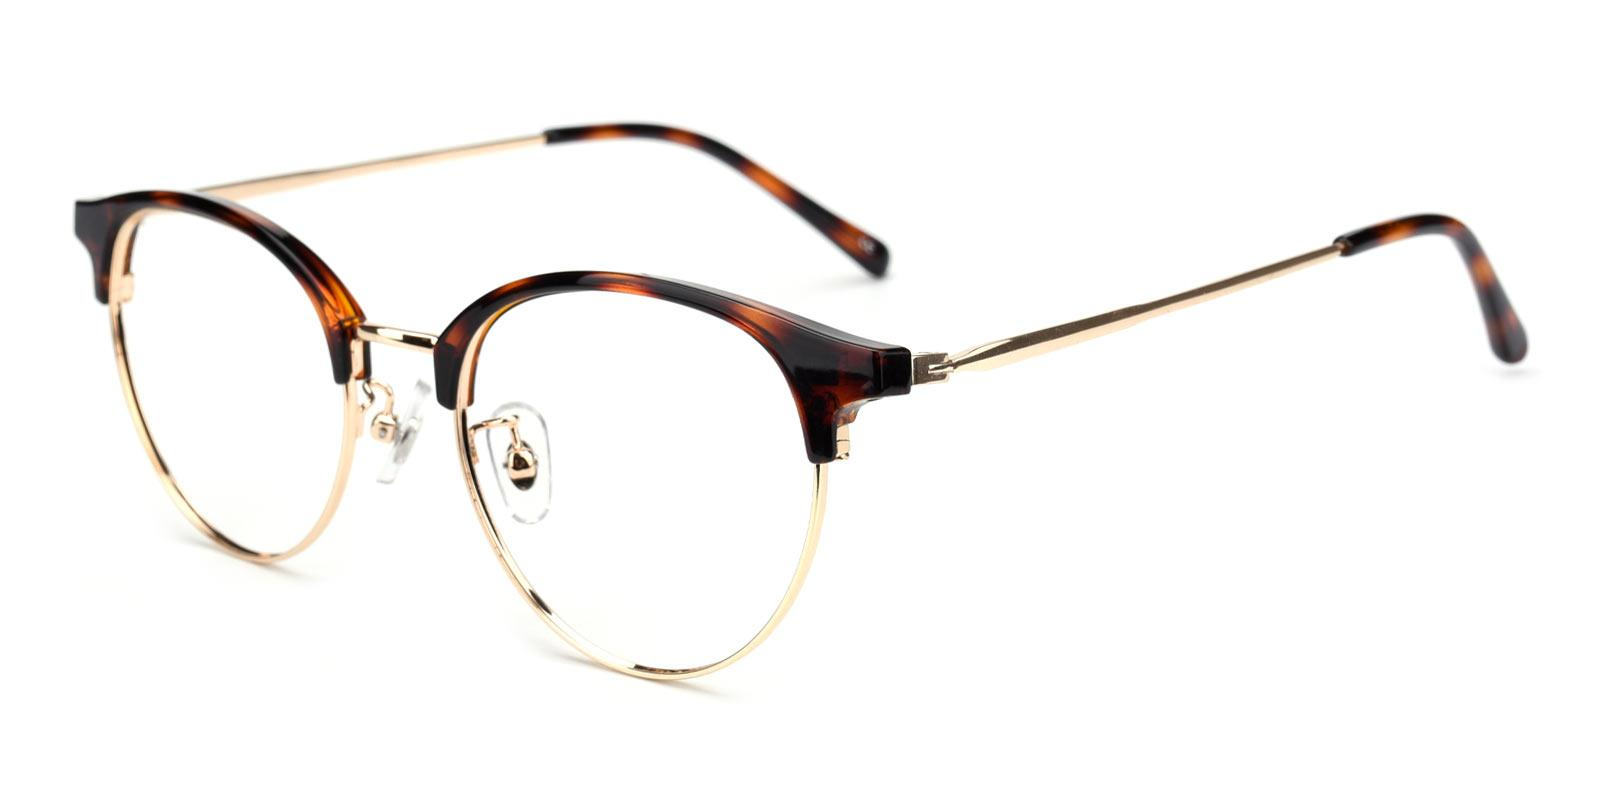 Gaze-Tortoise-Browline-Metal-Eyeglasses-additional1